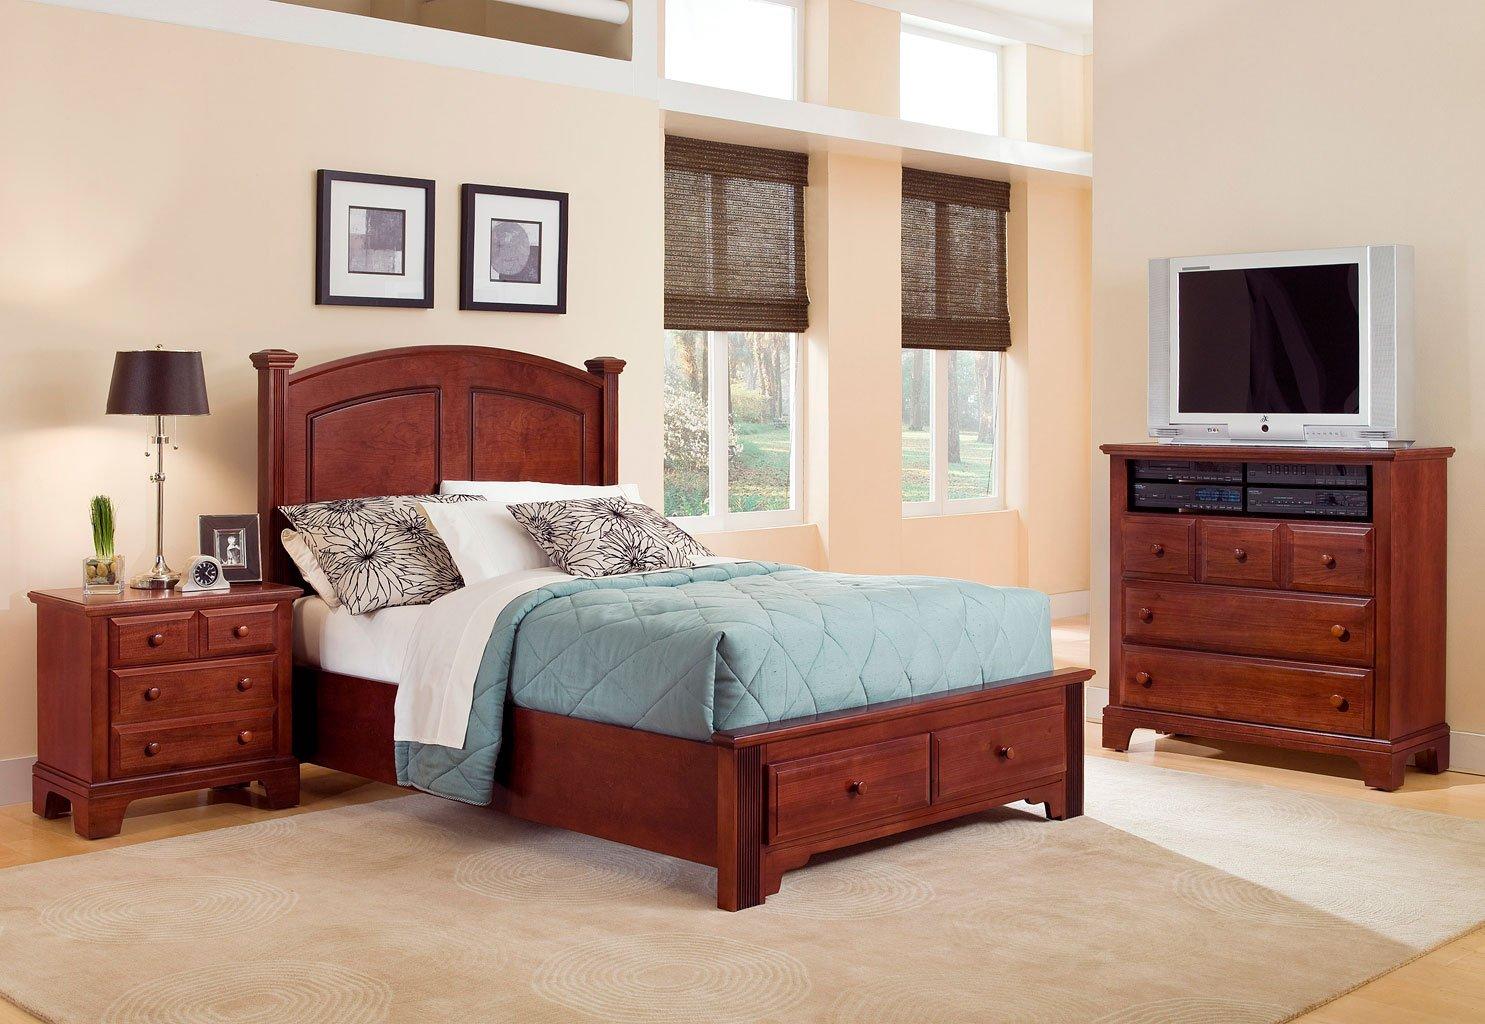 Hamilton franklin storage bedroom set cherry vaughan - Bassett bedroom furniture 1970 s ...